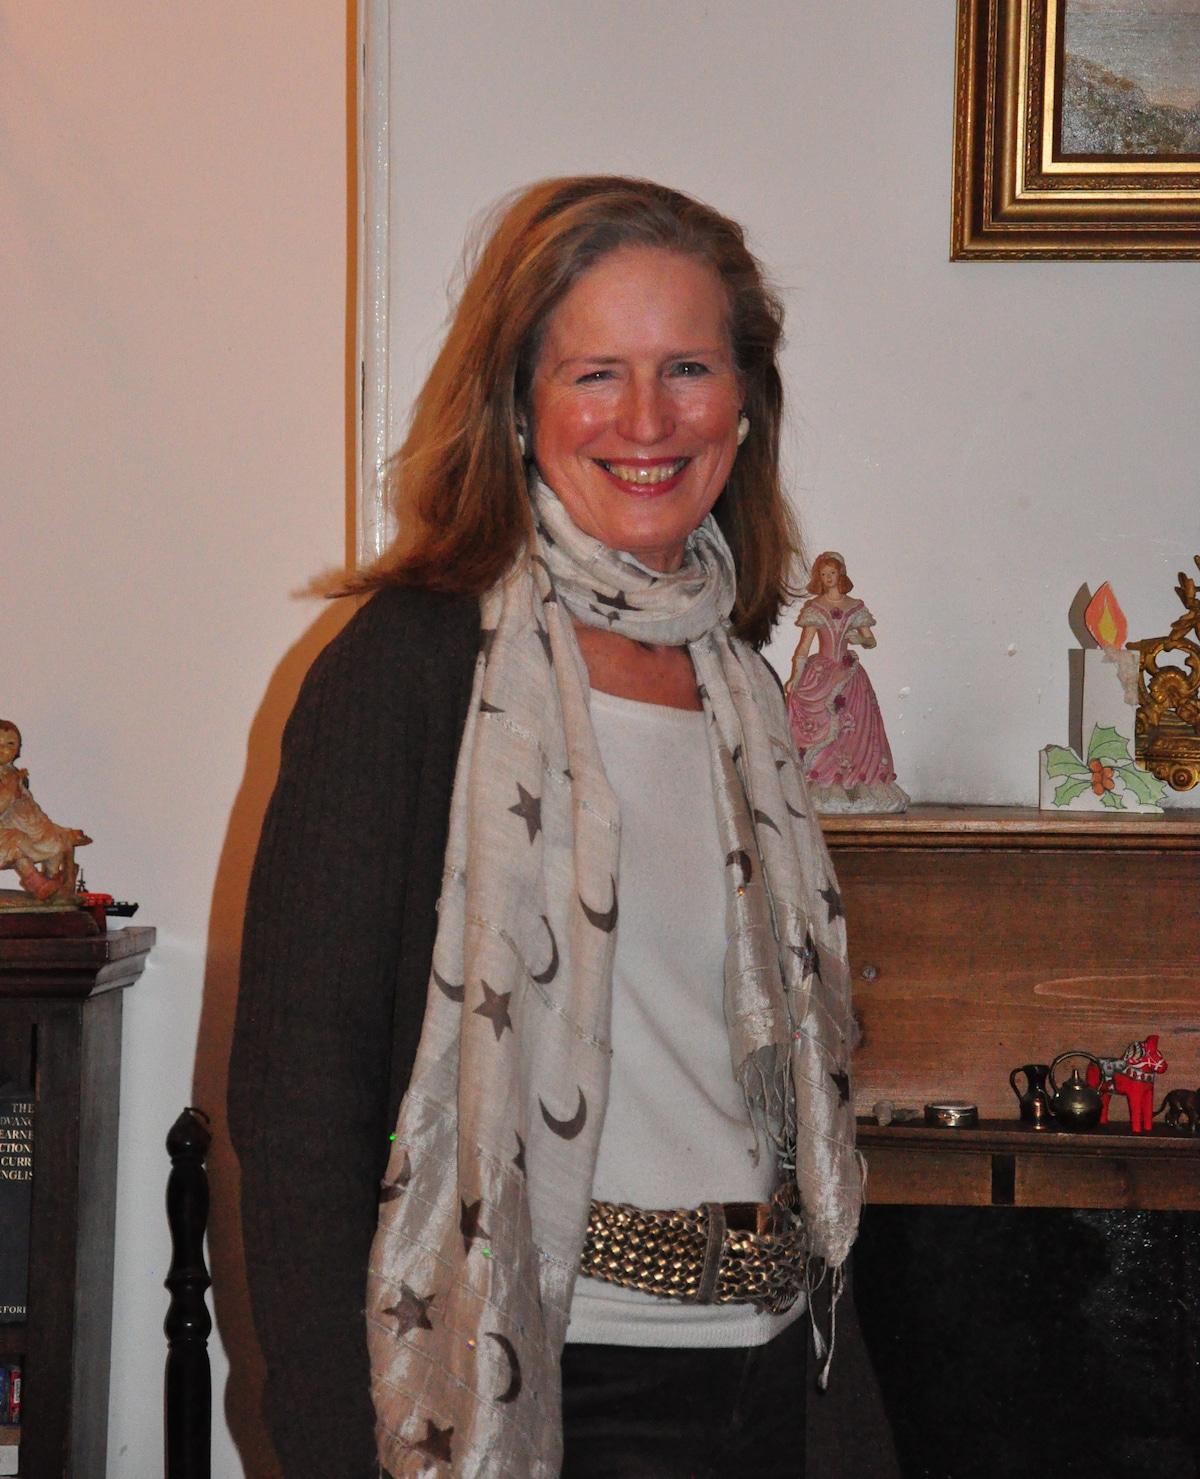 Deborah From Cowes, United Kingdom